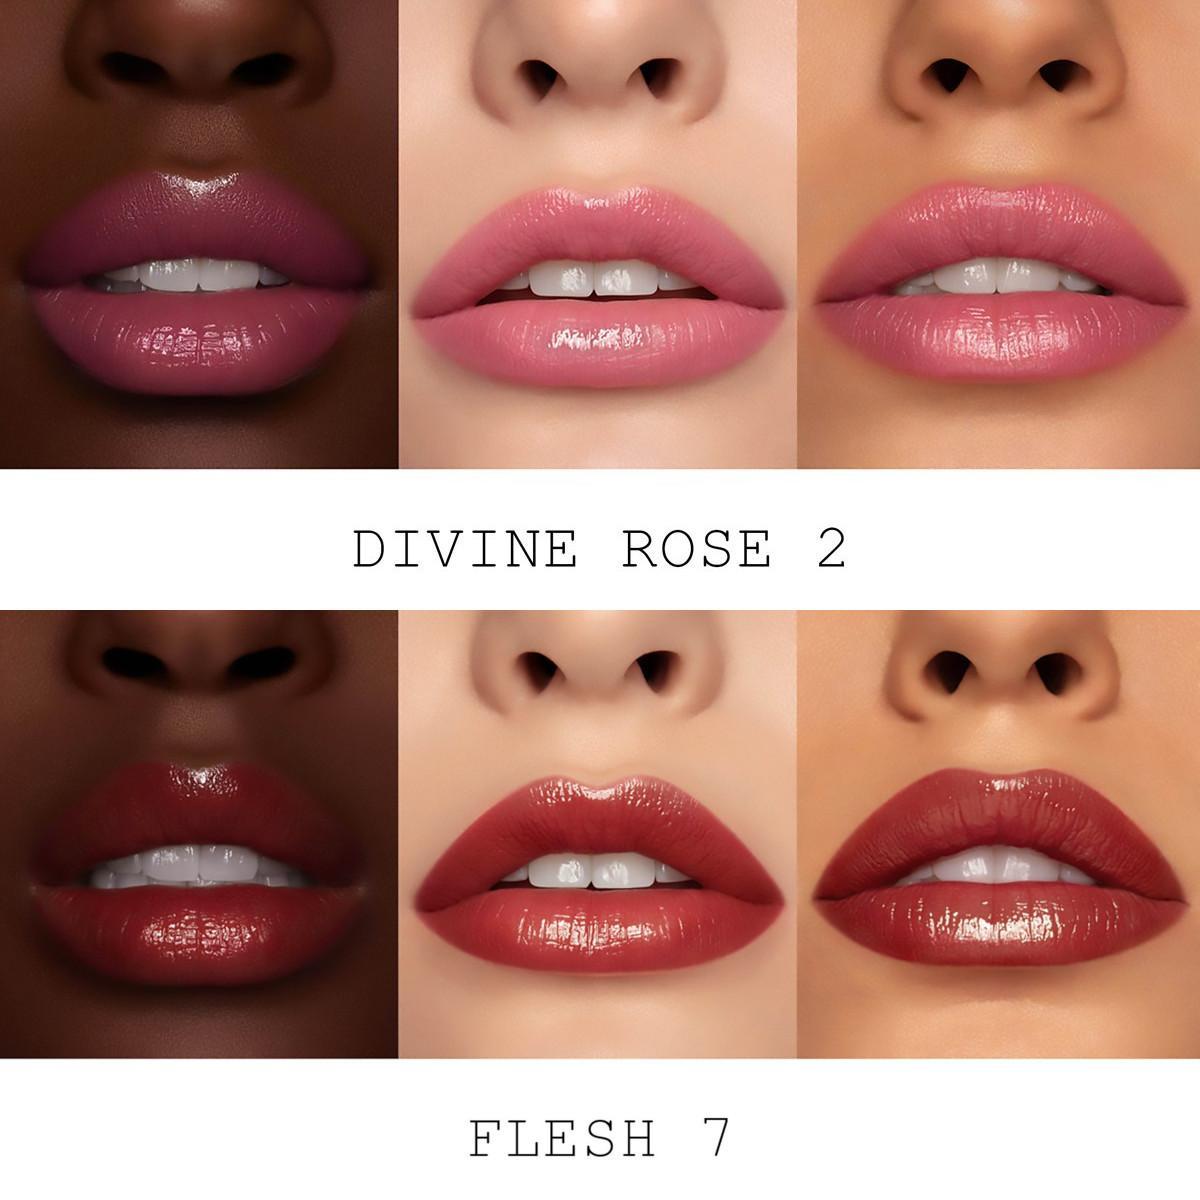 Pat McGrath Divine Blush Collection Lip Fetish Divinyl Lip Shine in Divine Rose 2 & Flesh 7 Lip Swatches